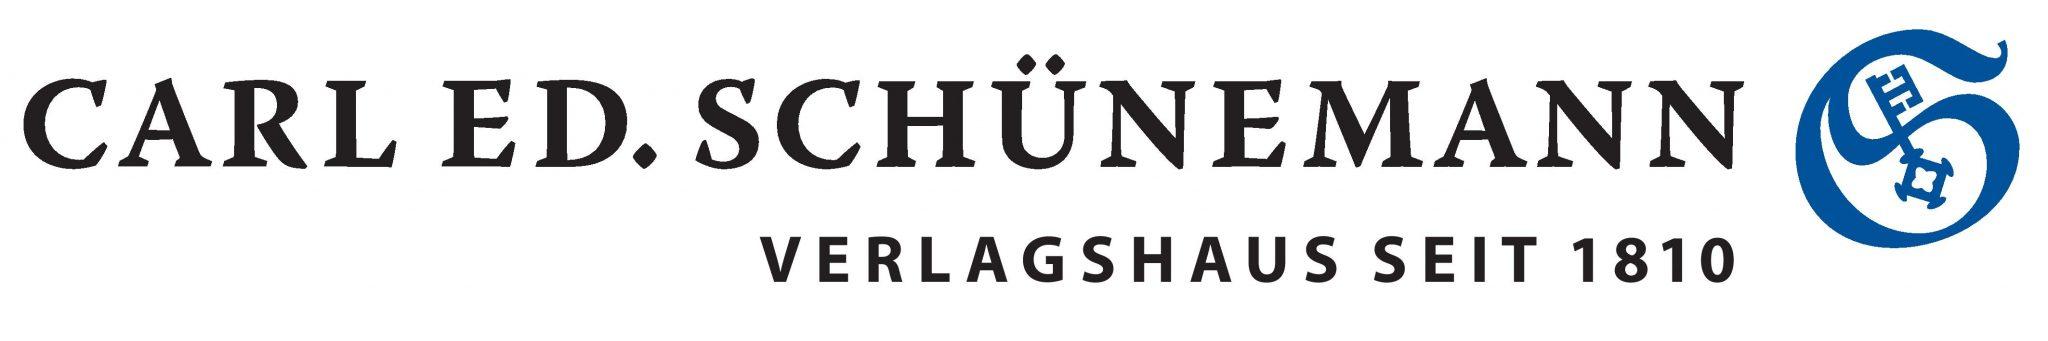 Logo Carl Schuenemann Verlag BremerLeseLust Foerderer